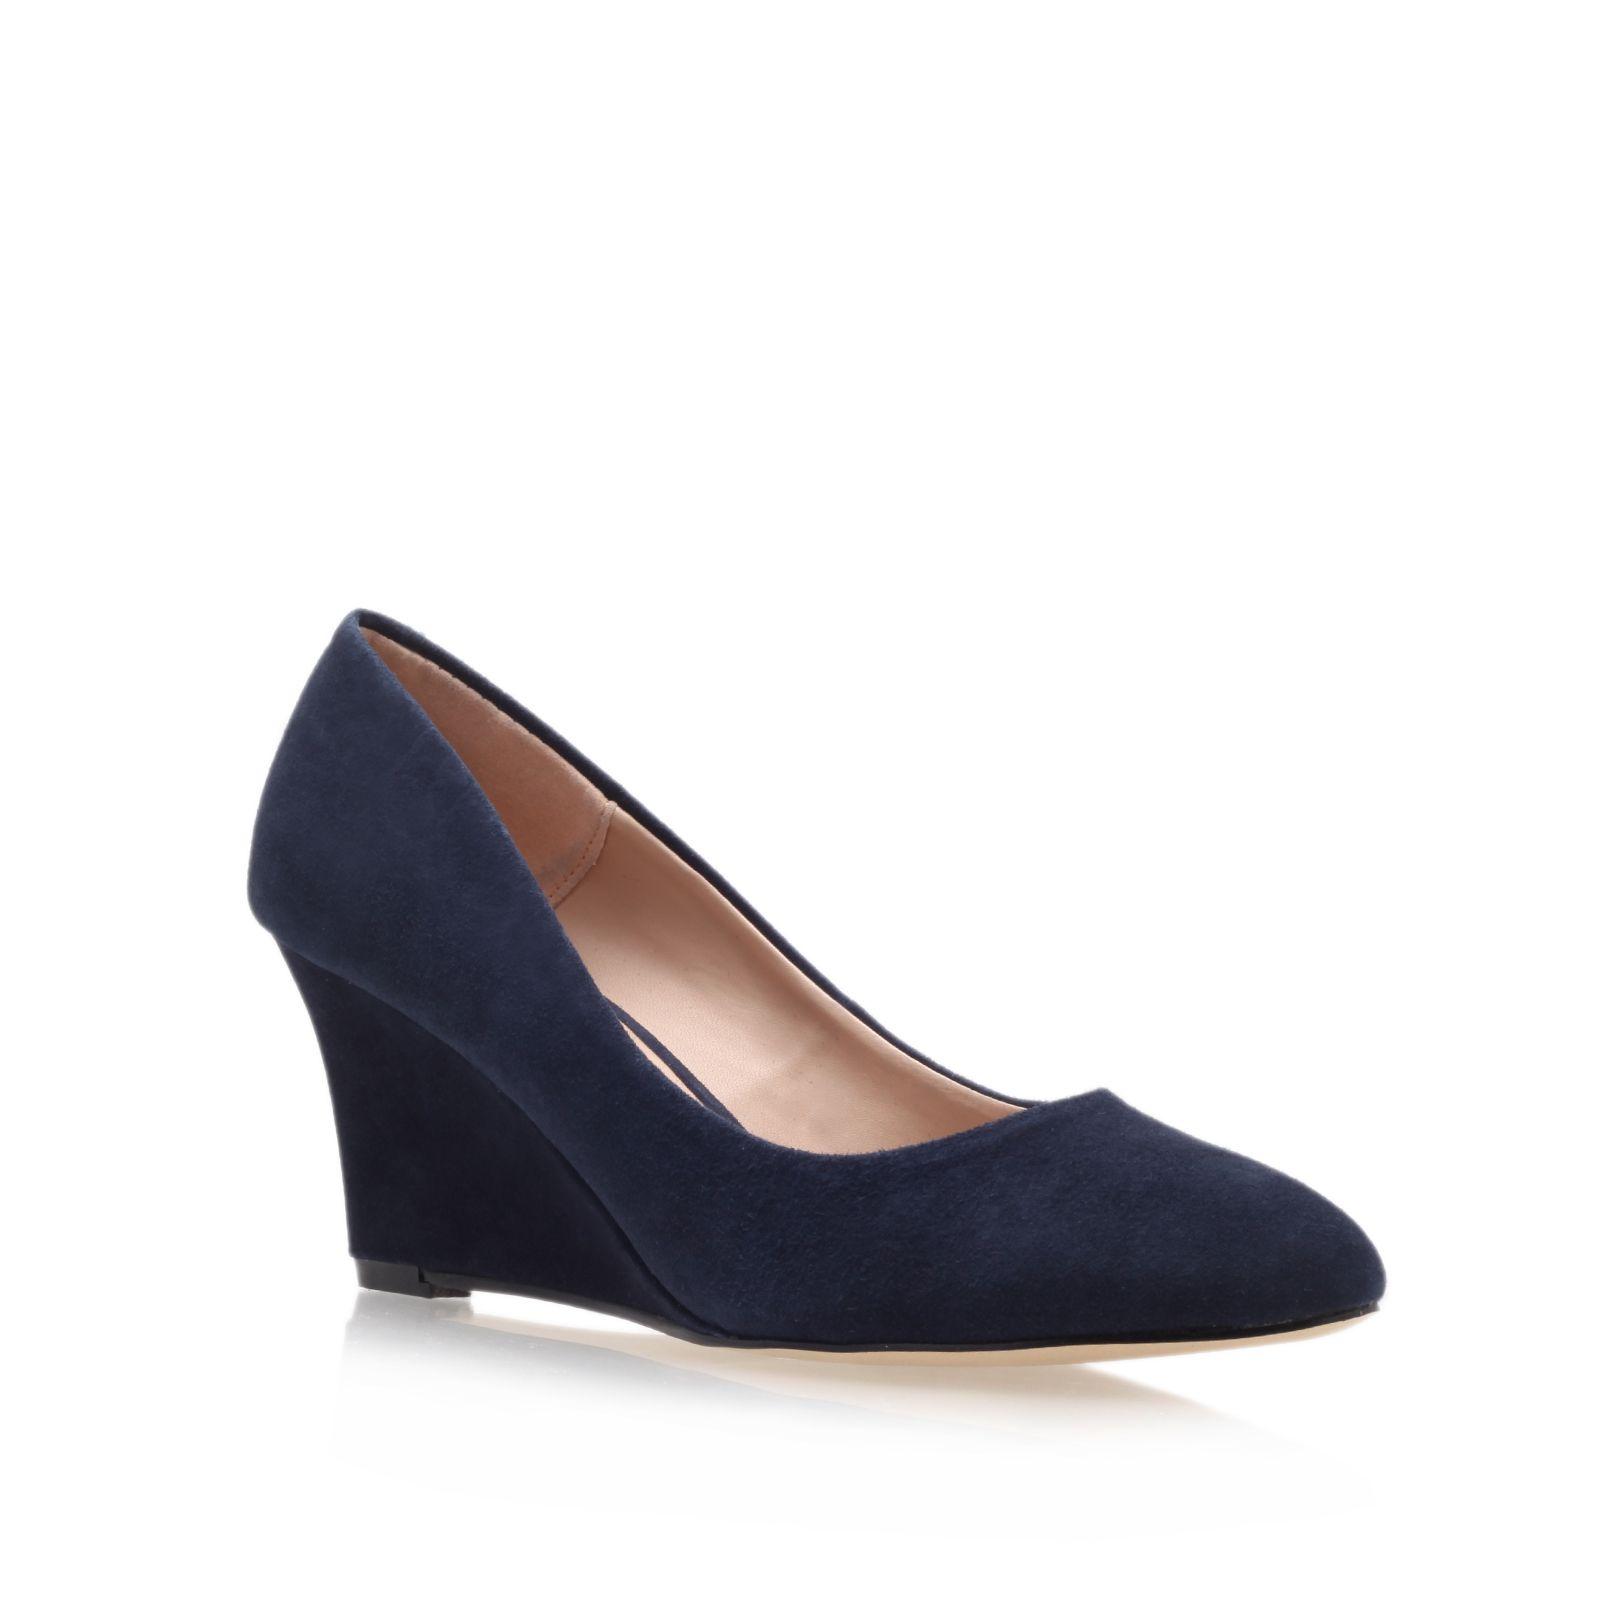 carvela kurt geiger krissy mid heel wedge court shoes in